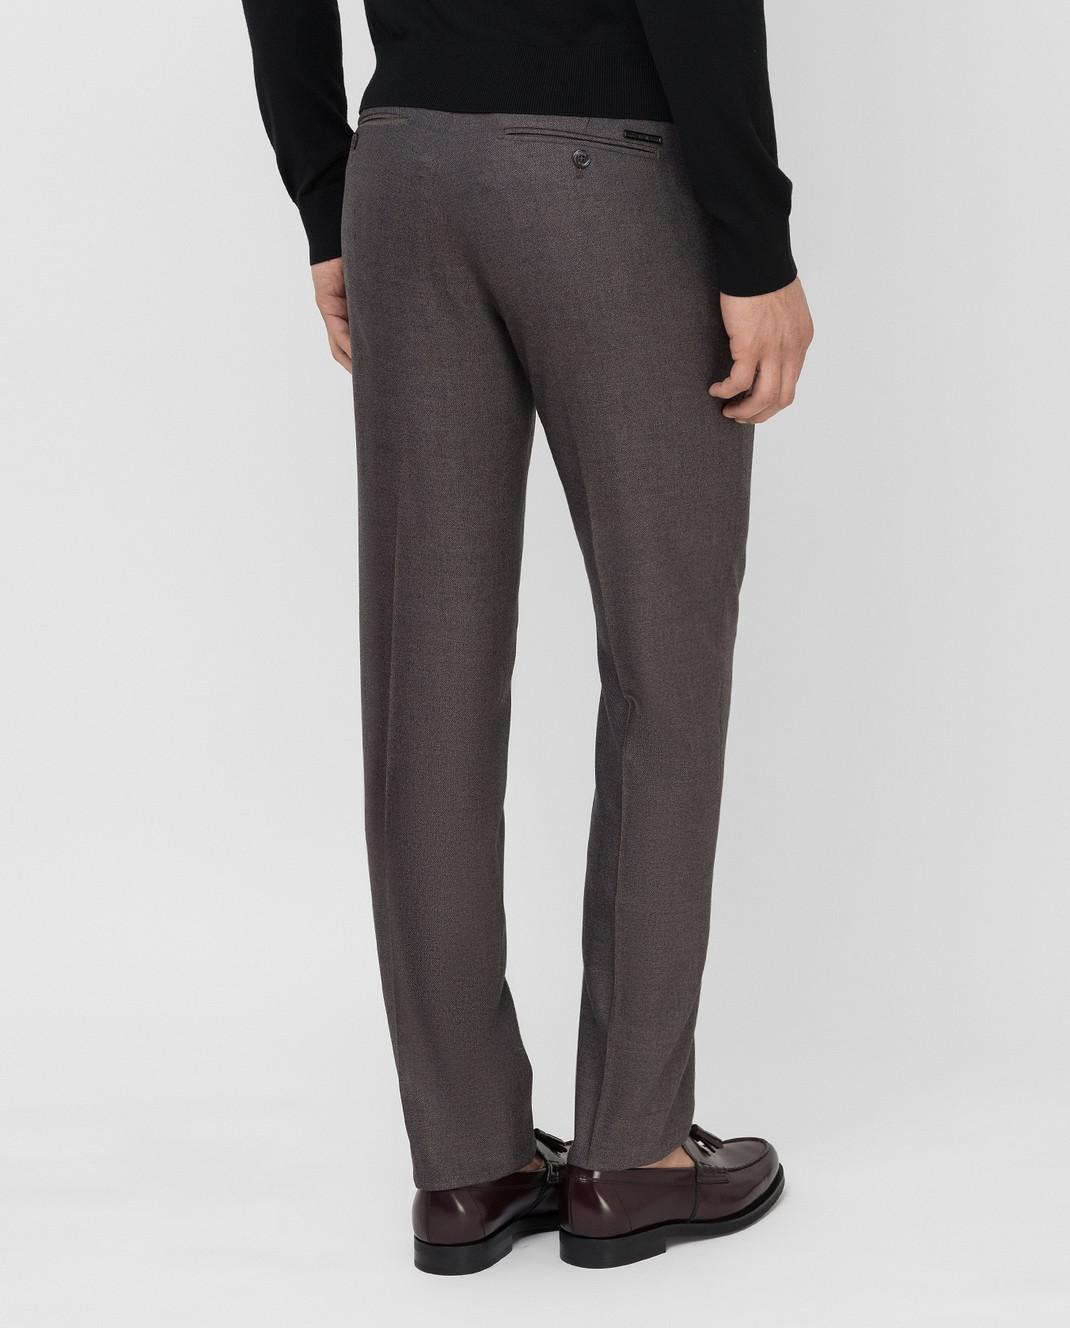 Stefano Ricci Темно-бежевые брюки из шерсти изображение 4